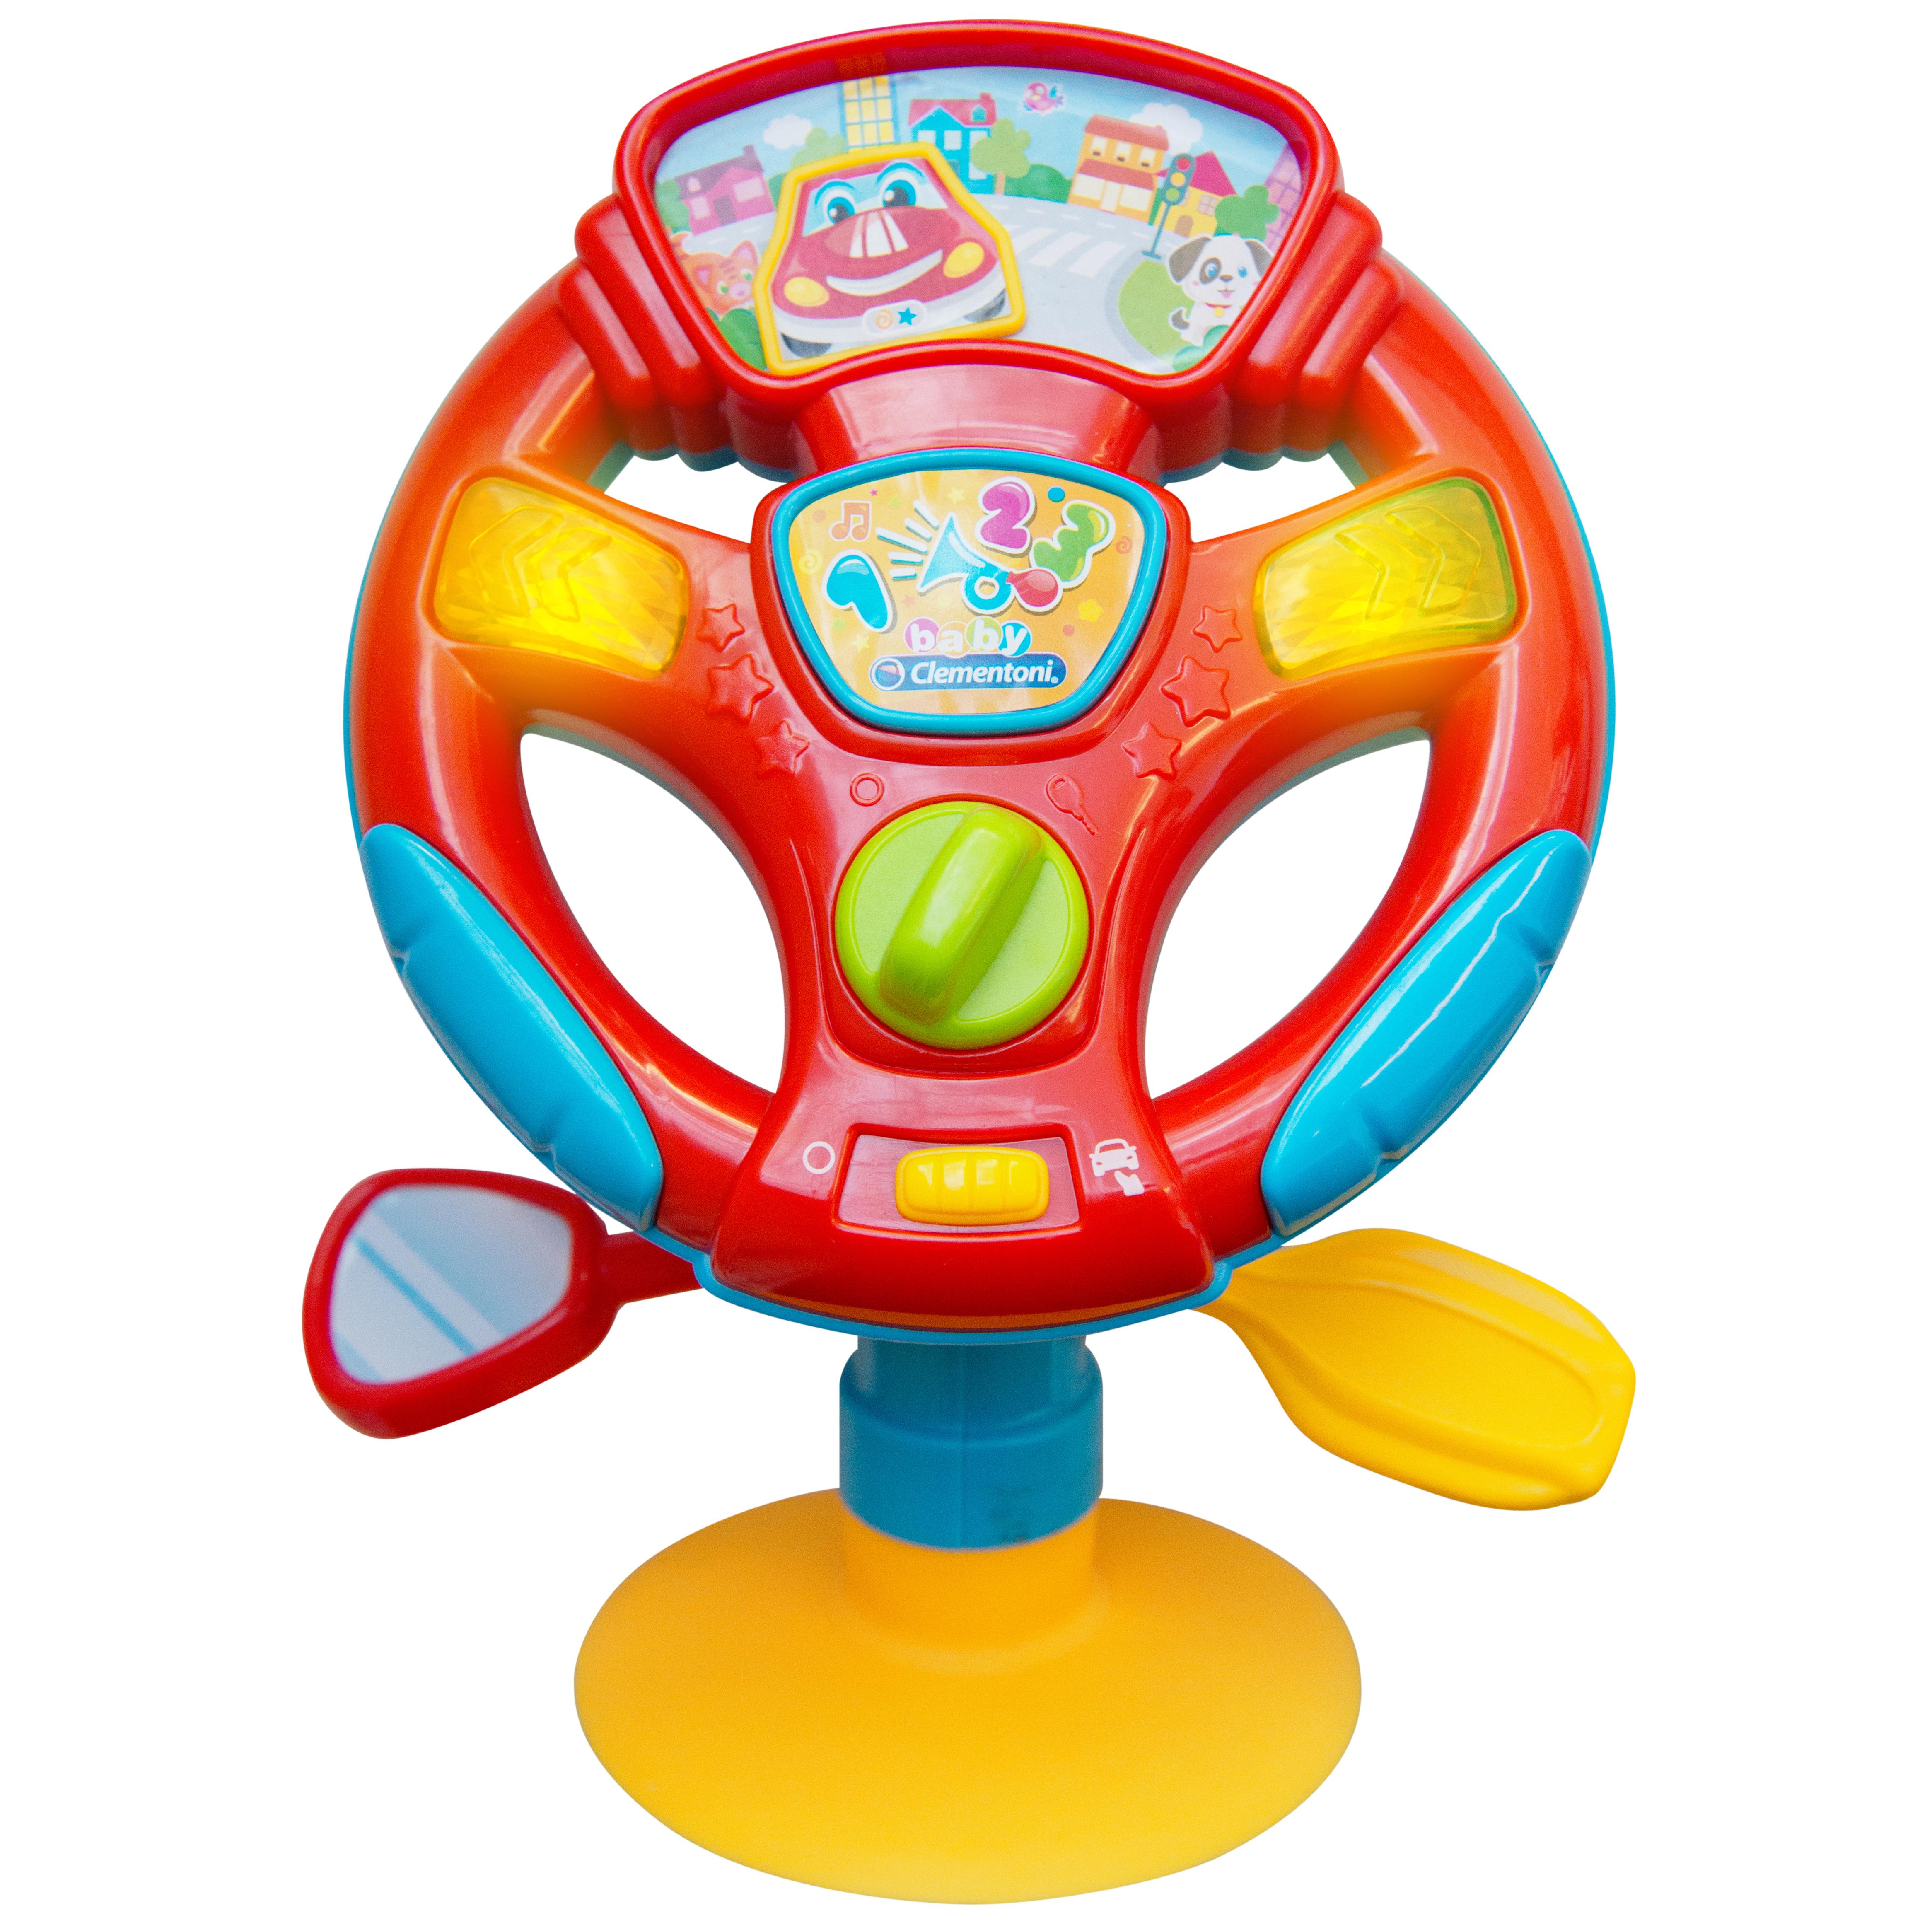 цена Развивающие игрушки Clementoni Clementoni со звуком